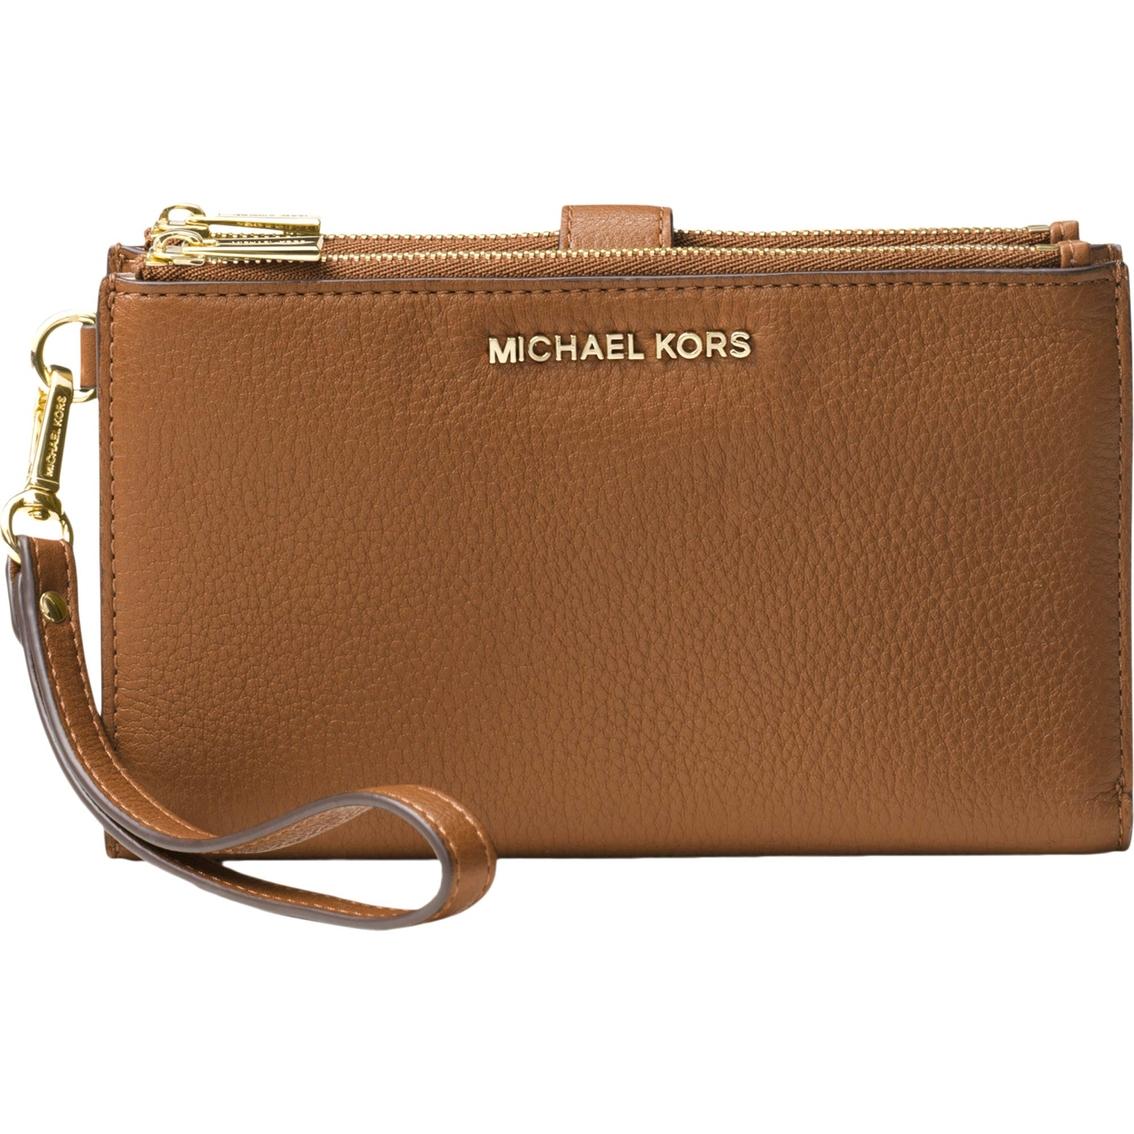 Michael Kors Women's Adele Leather Smartphone Wallet Acorn